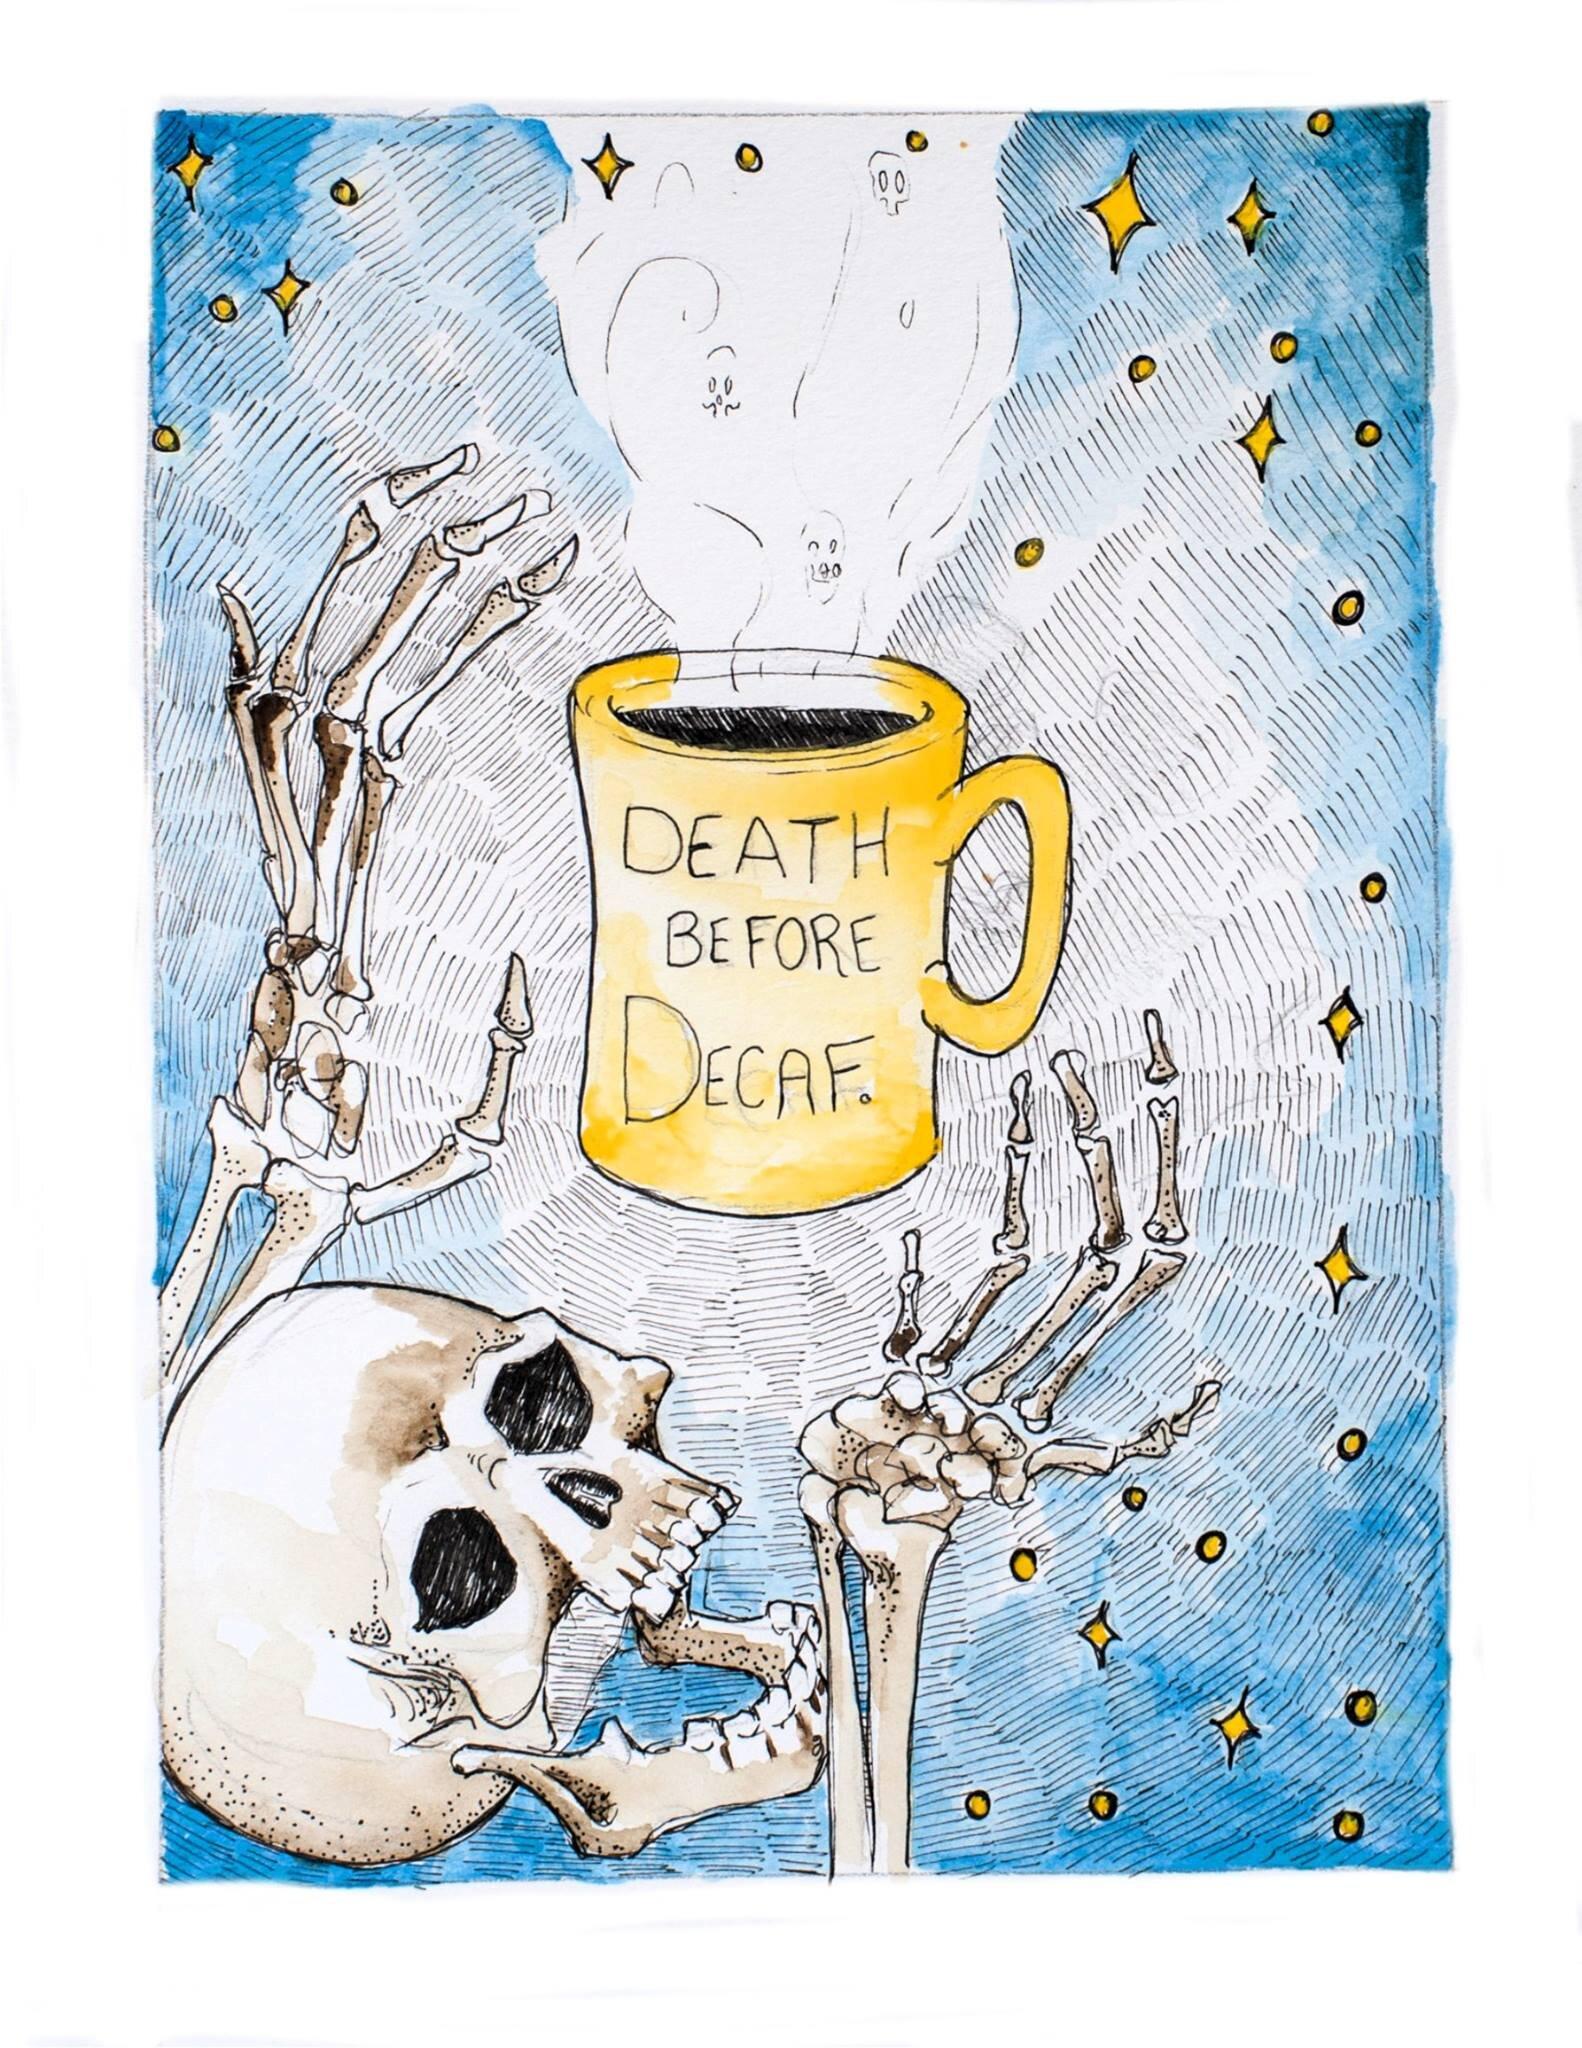 TristenOakenthorn_death before Decaf.jpg